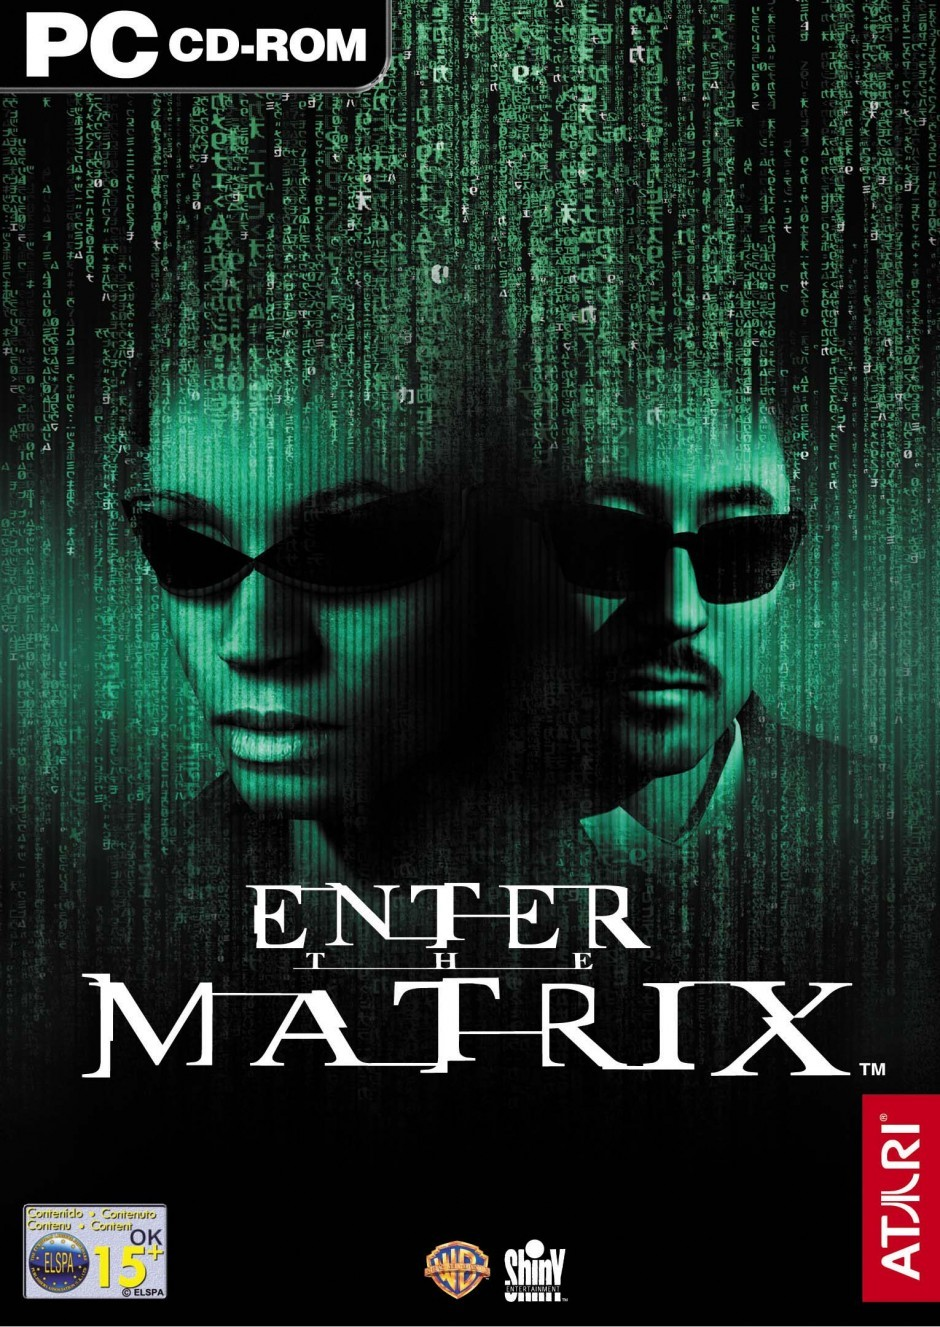 enter-the-matrix-4e26613515745.jpg&sa=X&ei=YpmBVY7ELcvwUrqQgMgB&ved=0CAkQ8wc&usg=AFQjCNHnG_ZRocNyTh_pJgEv4vALJTG22g